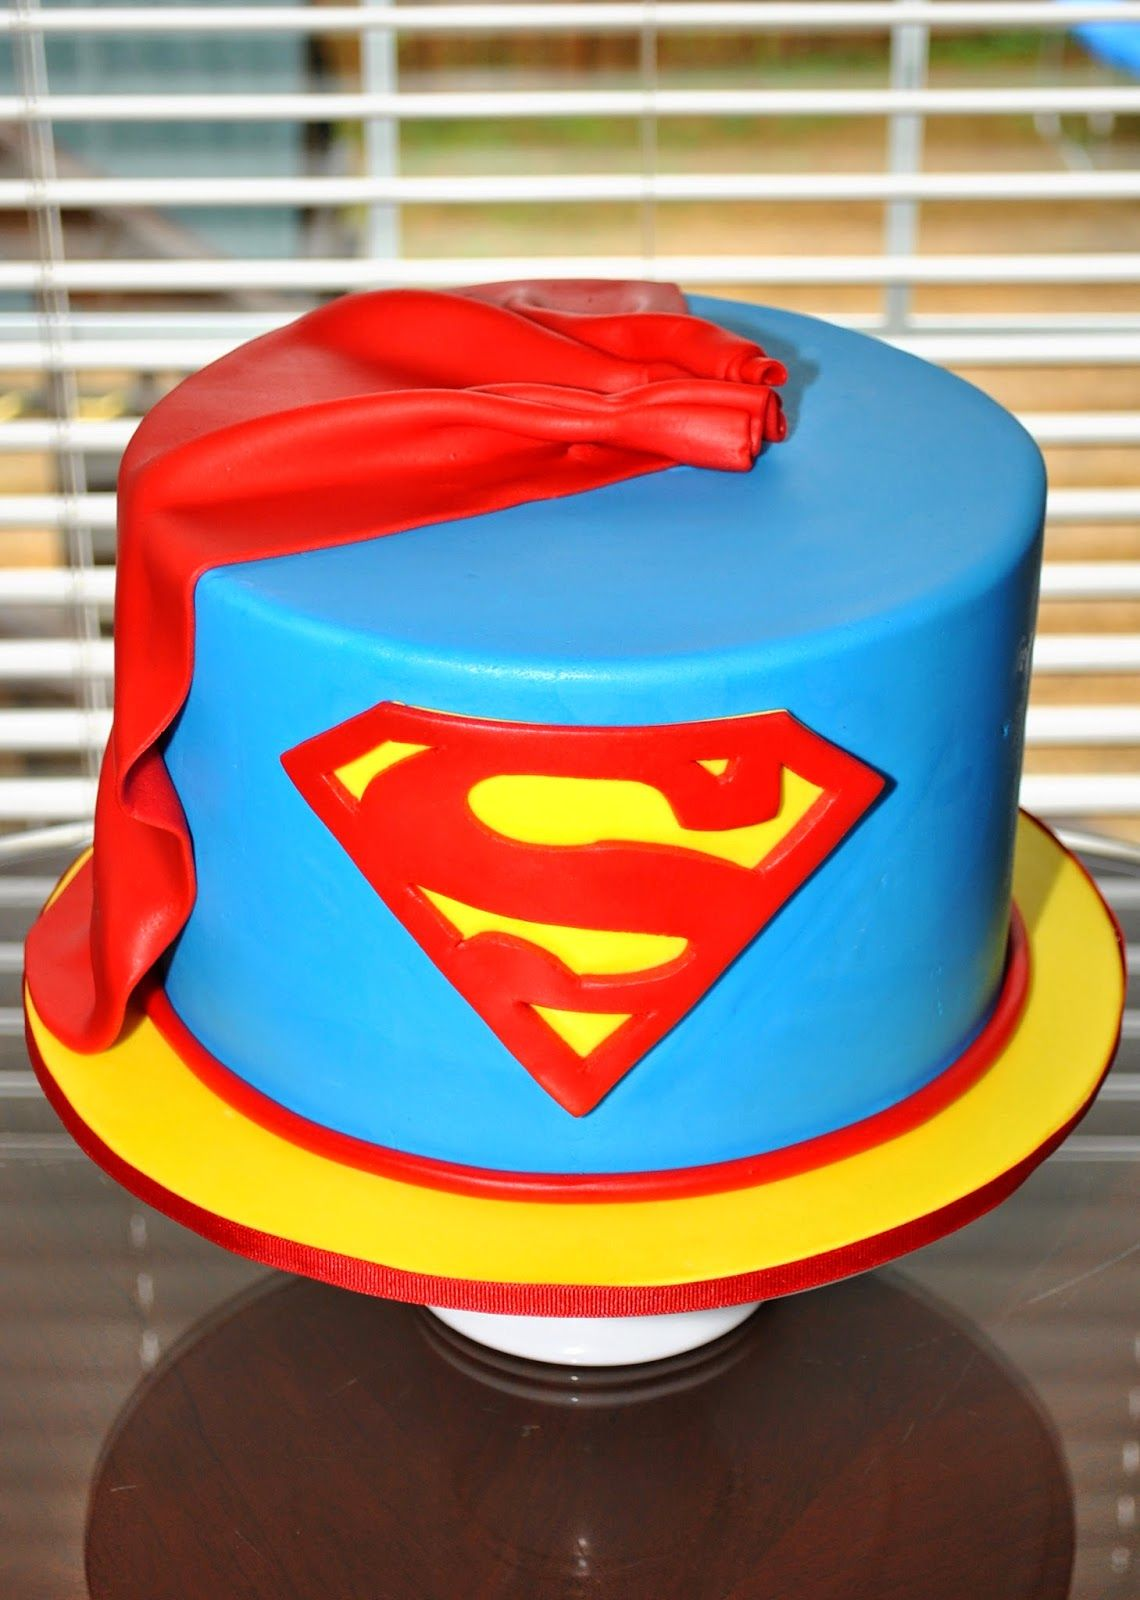 1000 ideas about superman cakes on pinterest batman cakes - Superman Cake Cake Ideas Pinterest Superman Cakes Cake And Birthdays